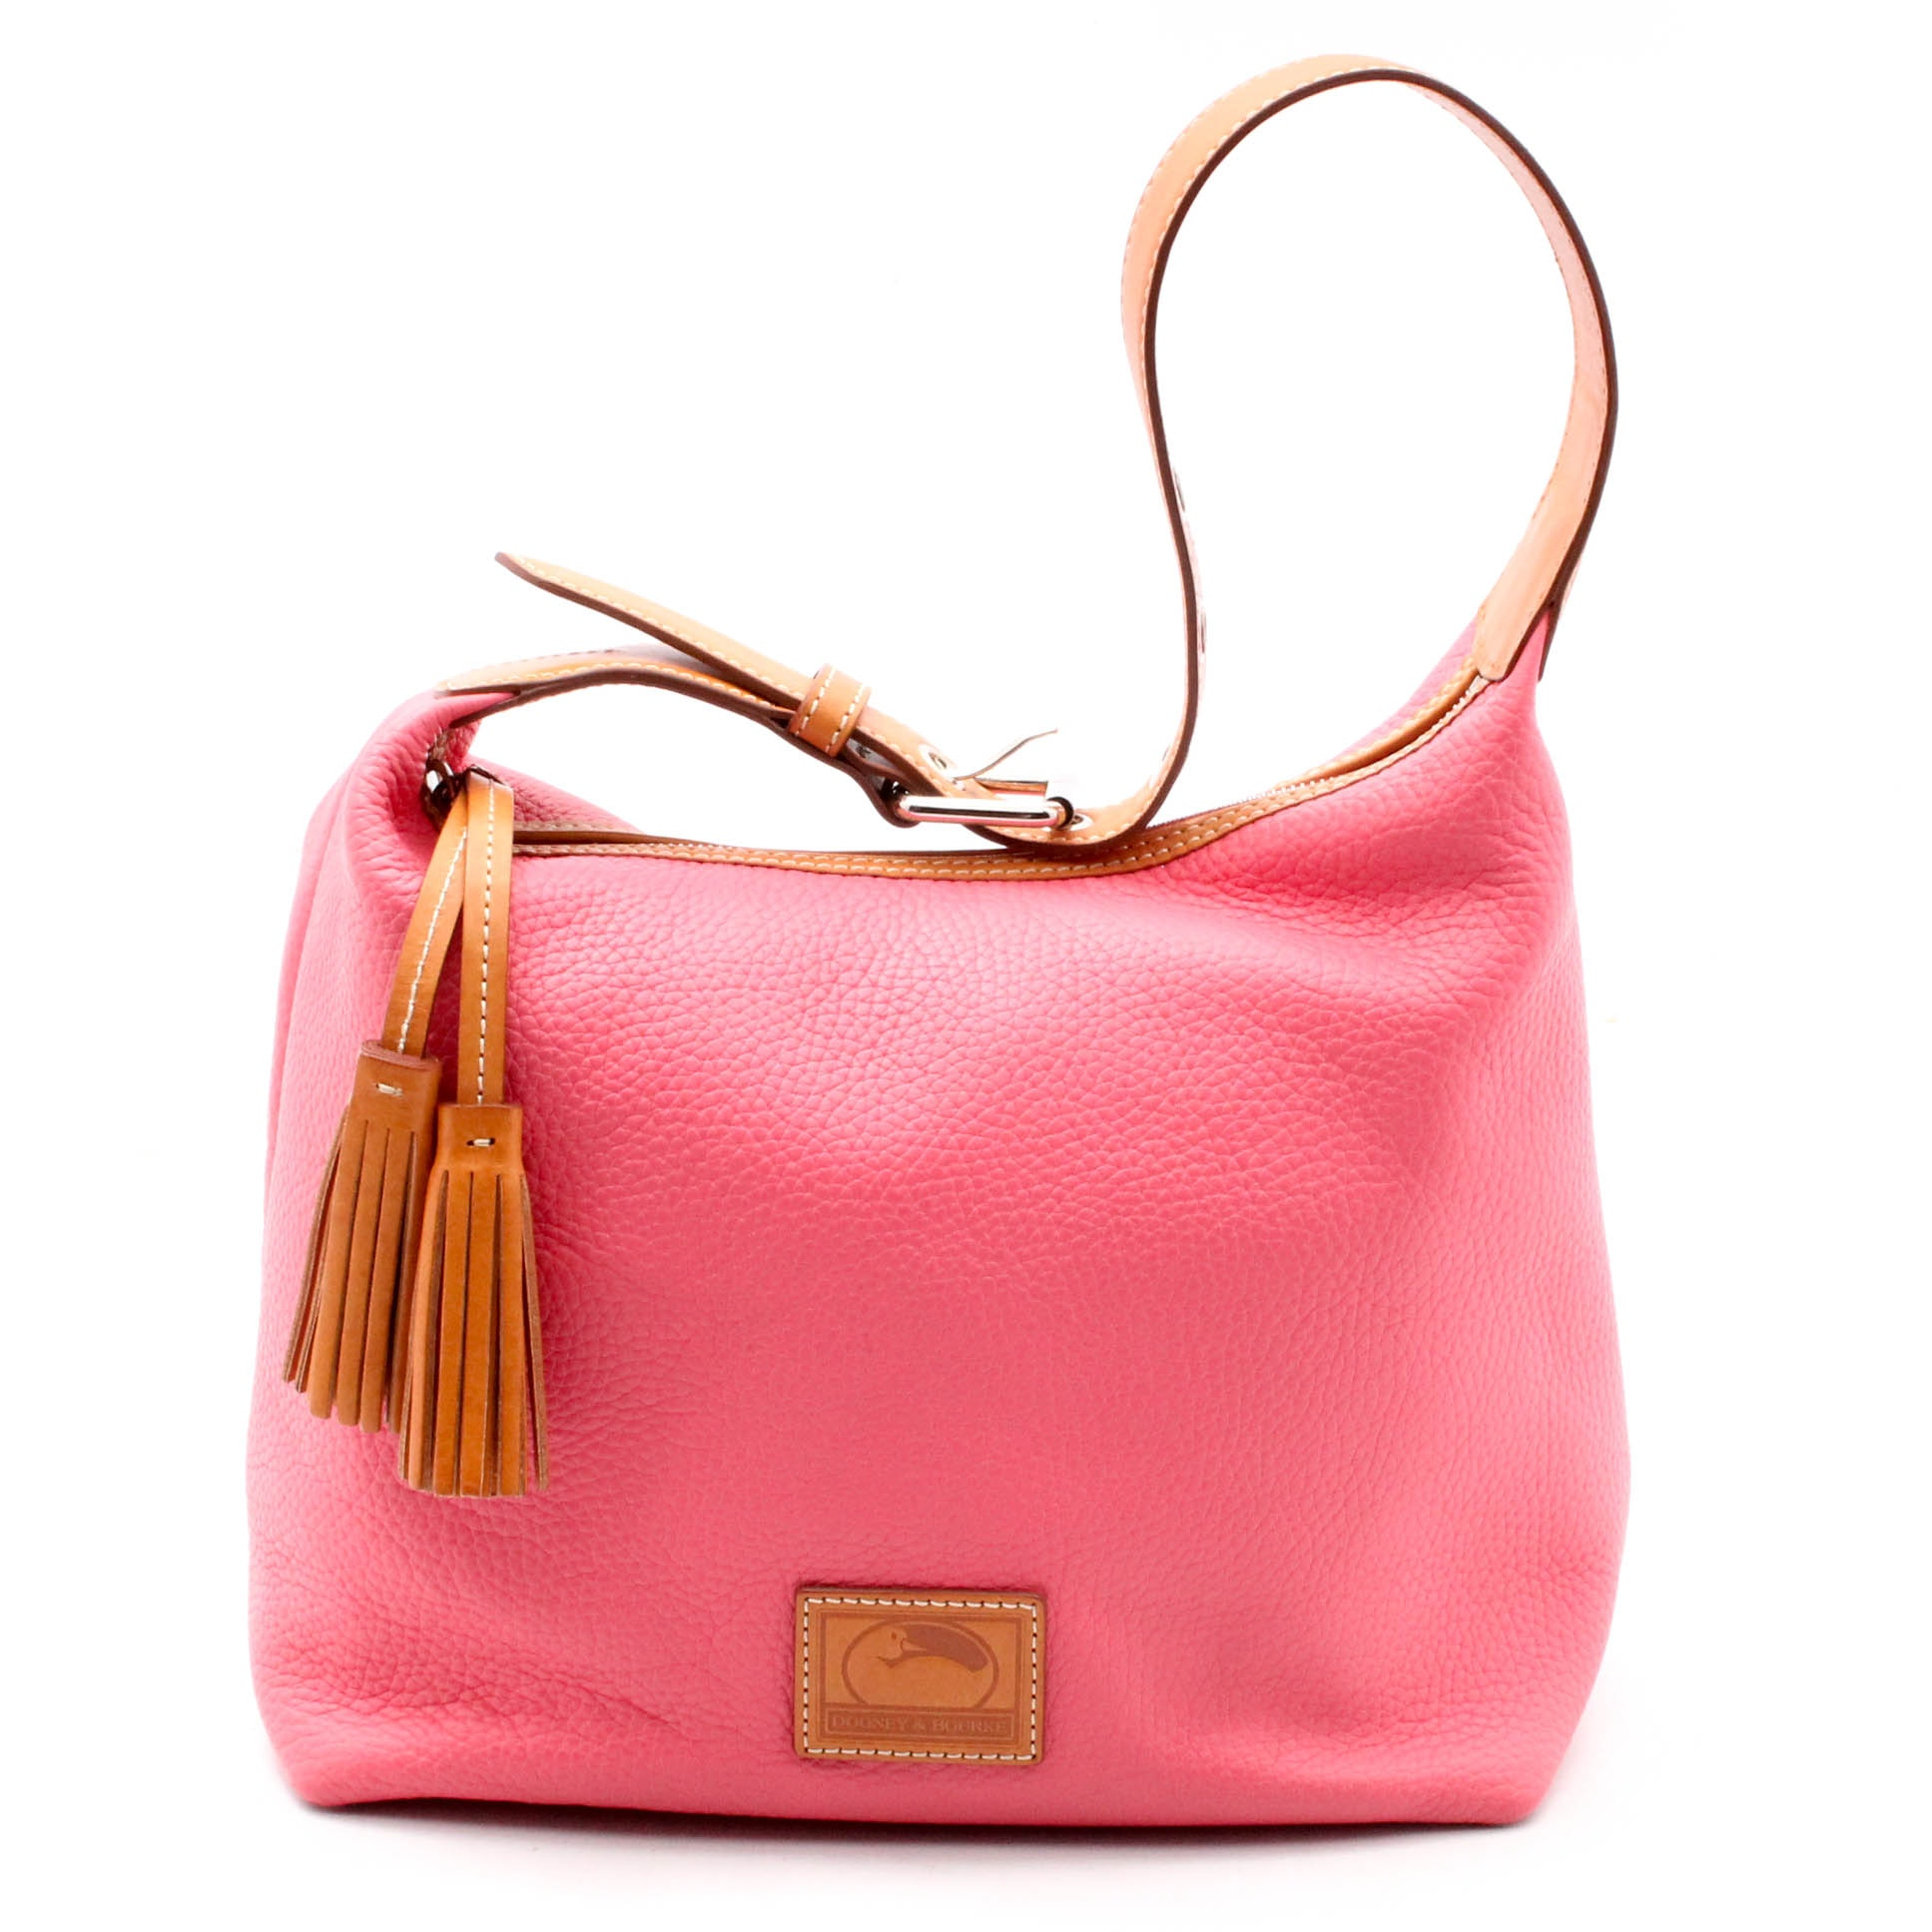 Dooney & Bourke Paige Sac Pebbled Leather Bucket Bag